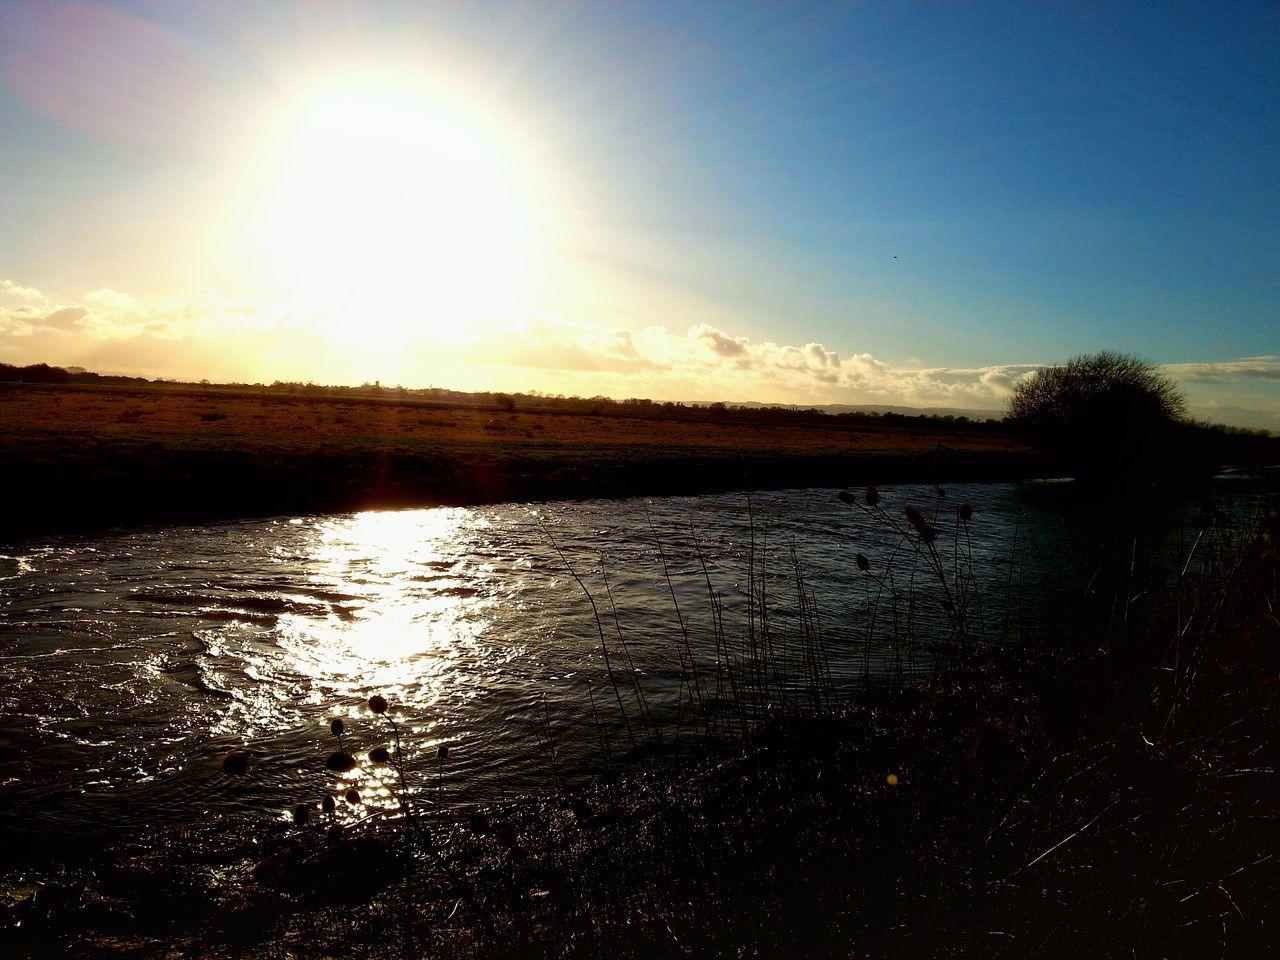 Somerset Levels Uk Bird Sanctuary Gray Lakes Nature On Your Doorstep River Bank  Evening View Taking Photos Enjoying Life